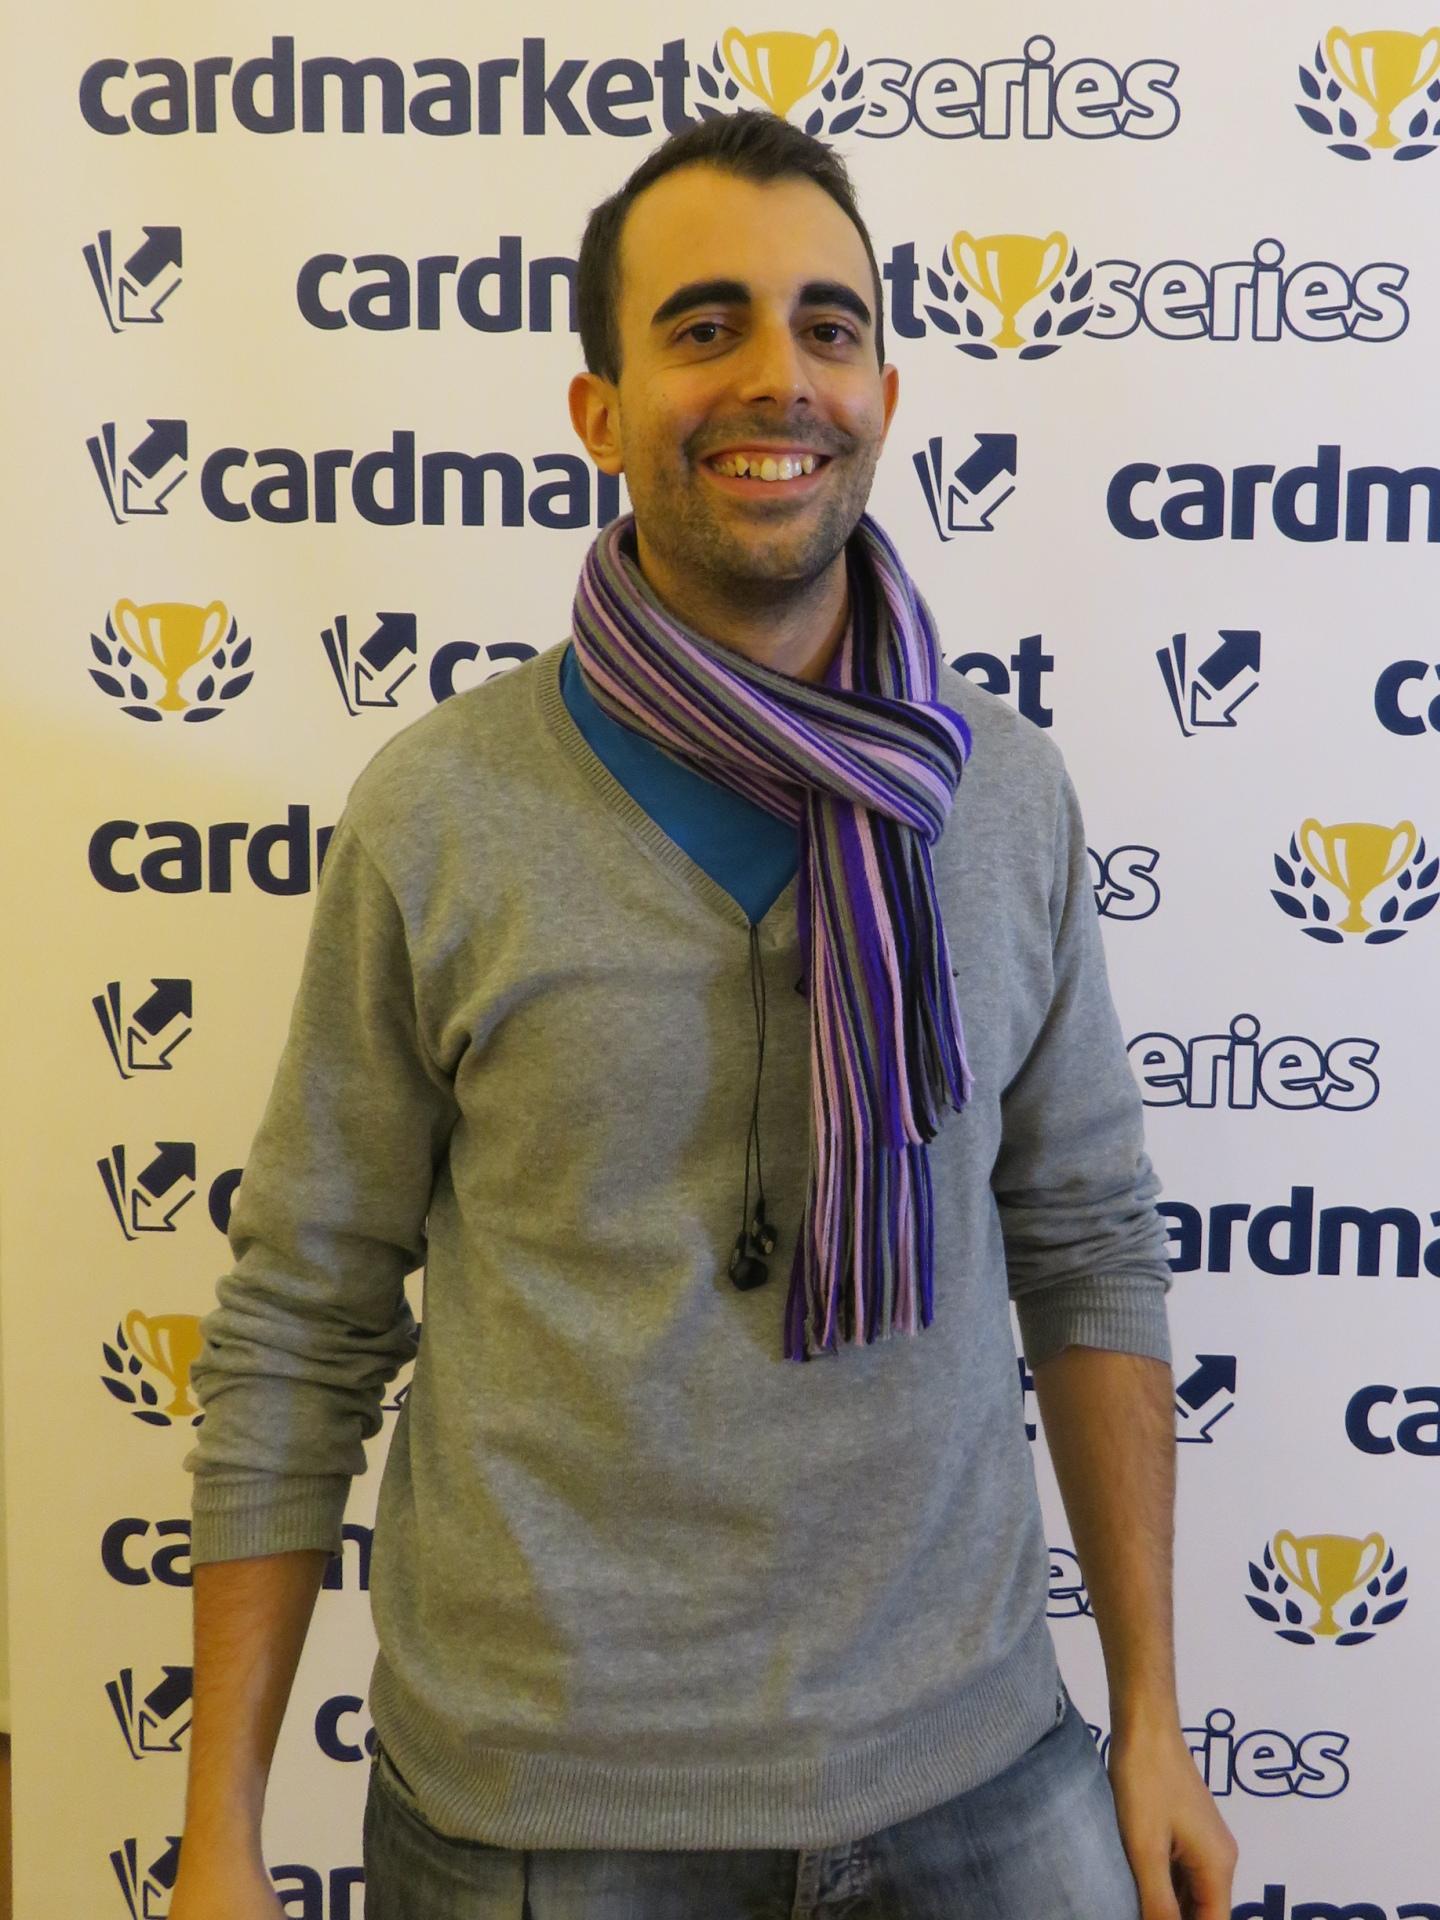 Pablo Abejer Garcia